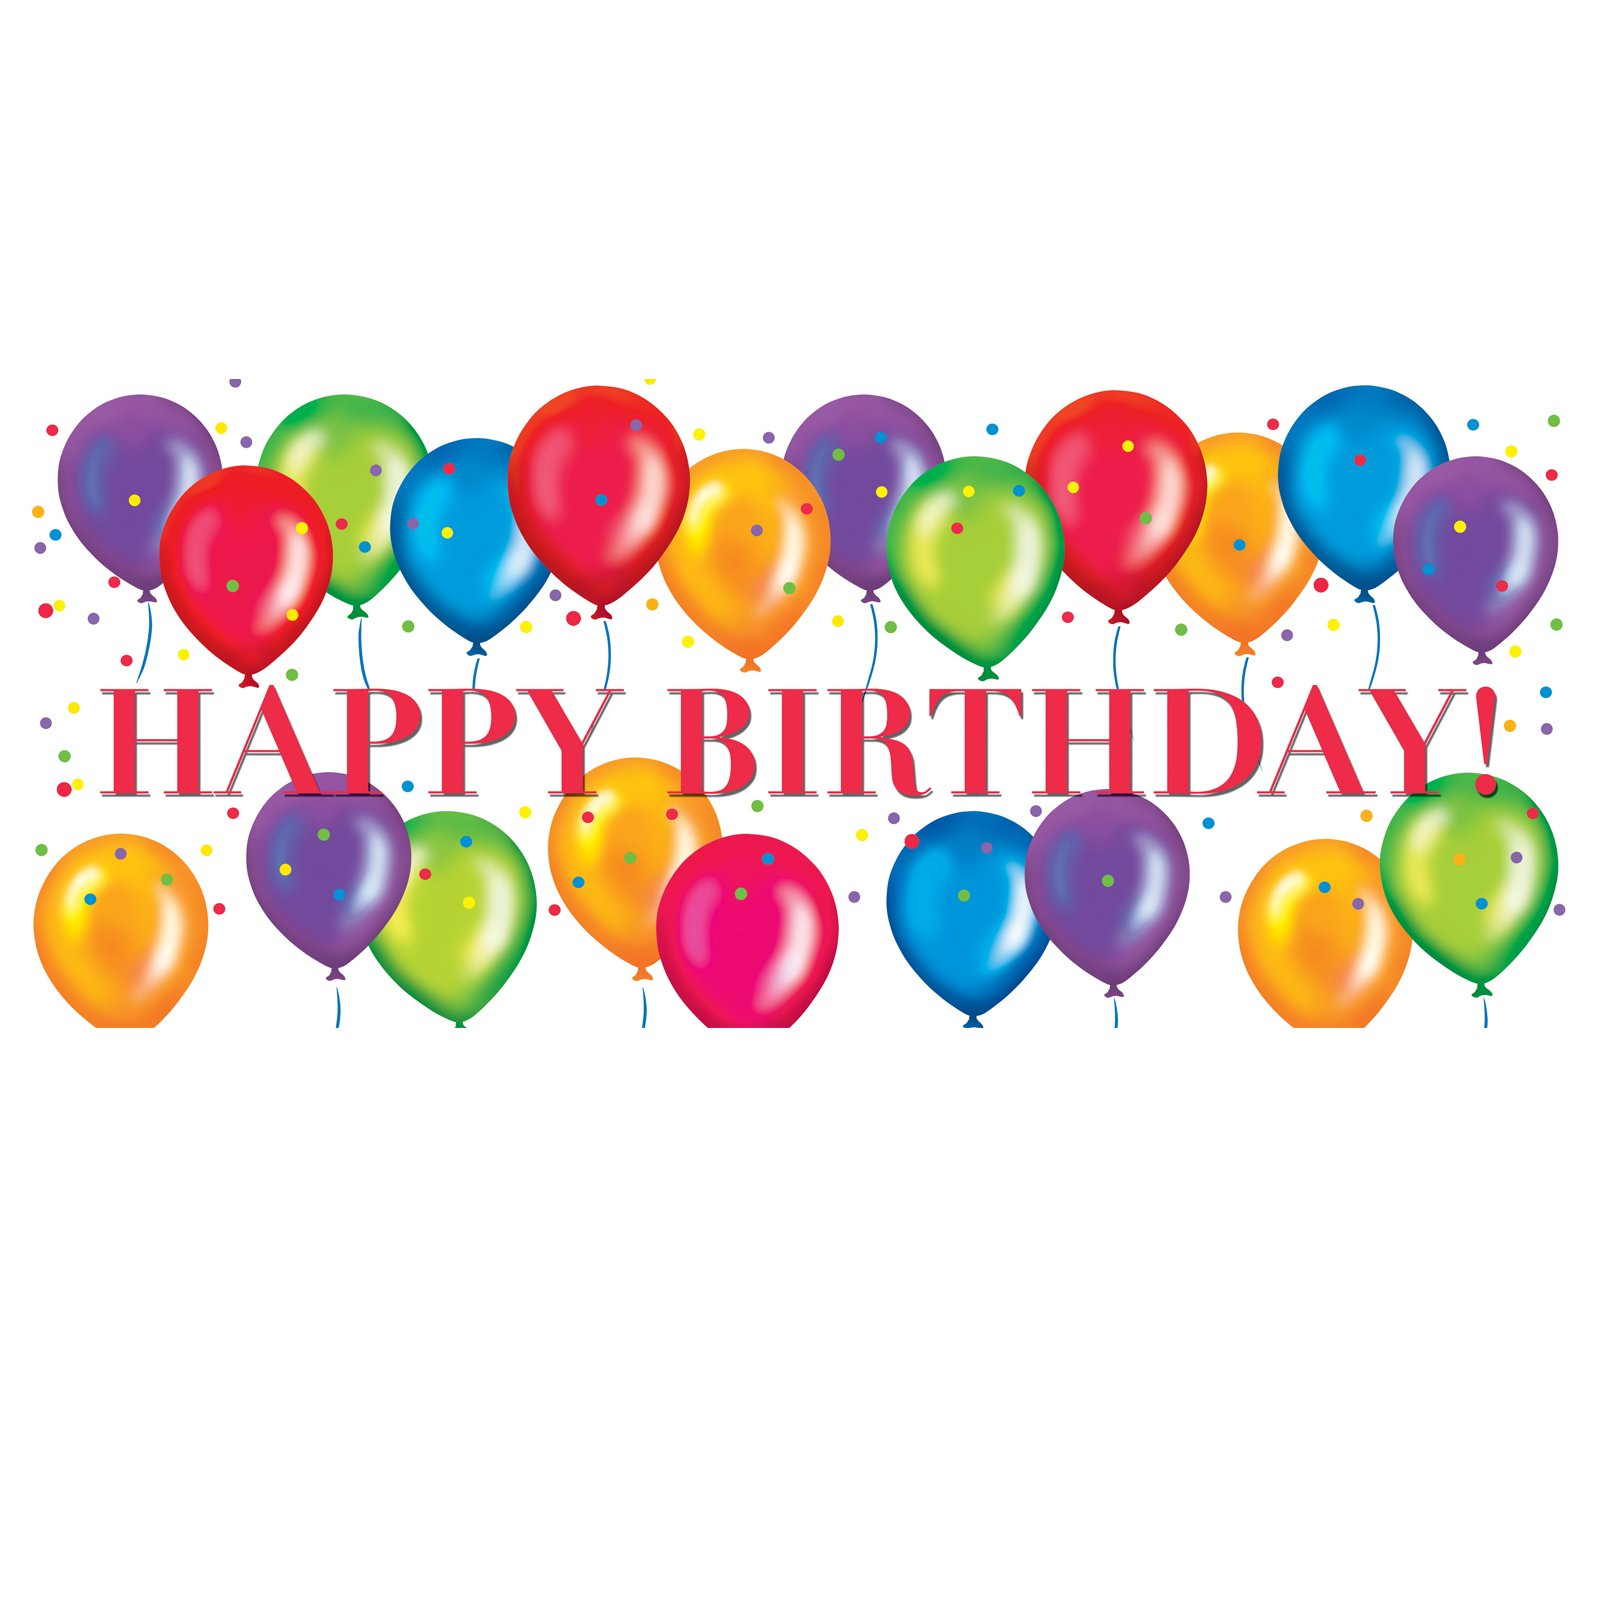 1600x1600 Free Birthday Balloons Clipart Image